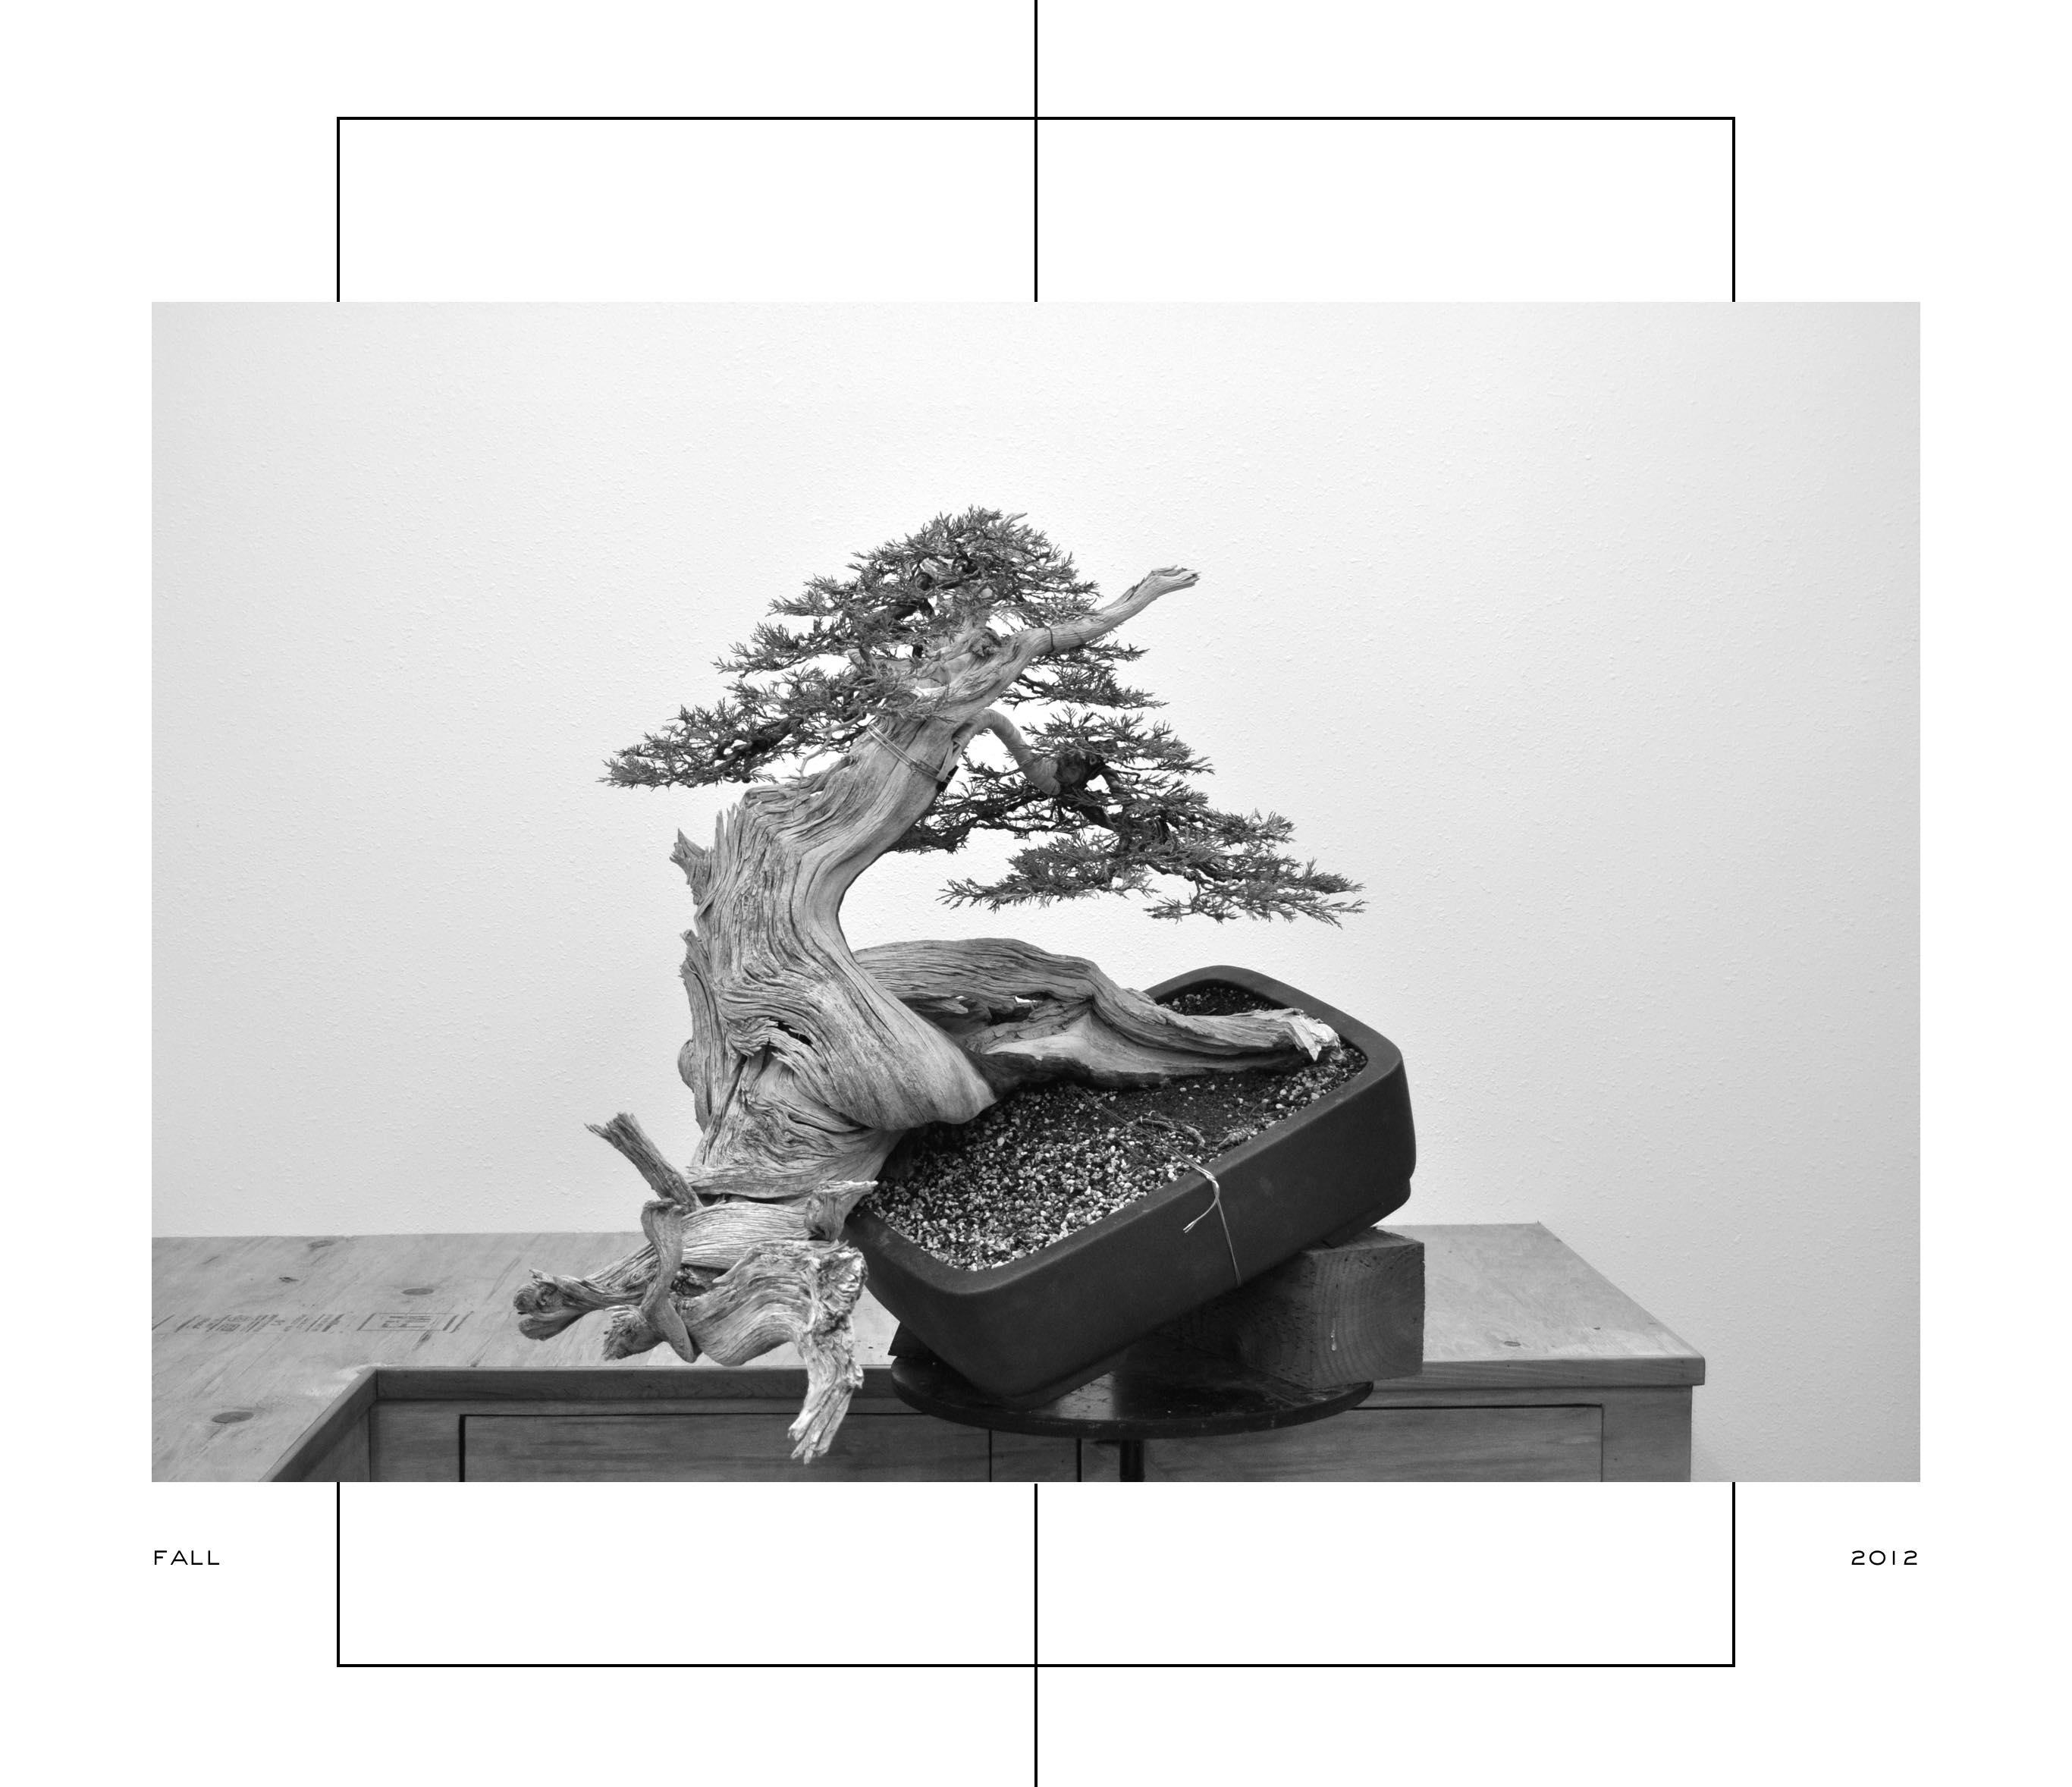 Ryan_Neil_Bonsai_Bonsai Mirai_Rocky Mountain Juniper_Style_Styling_Repot_Workshop_Pacific North West